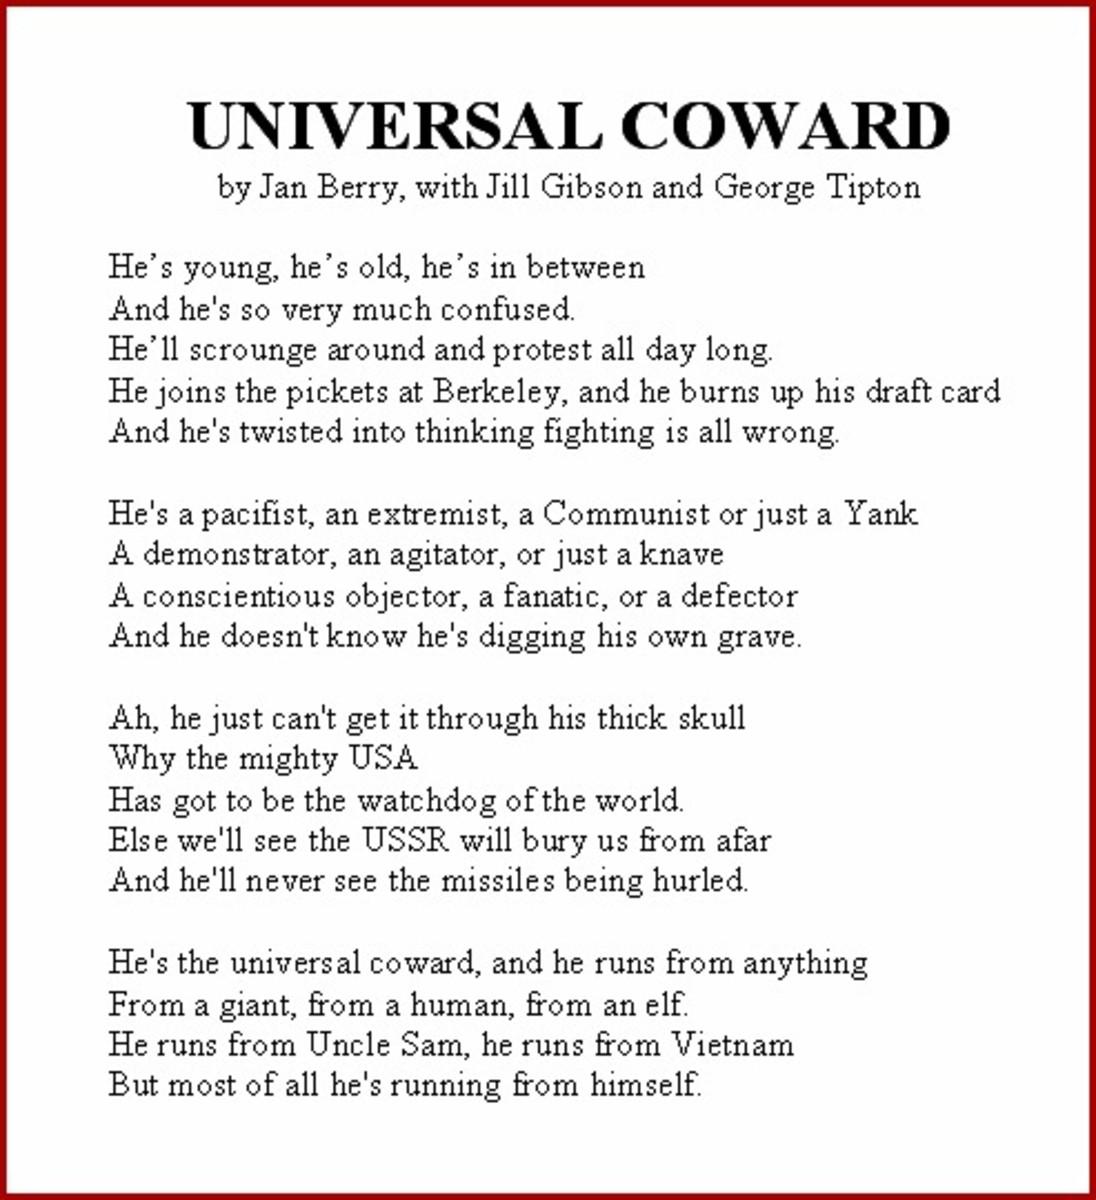 Universal Coward Vietnam War Song Lyrics